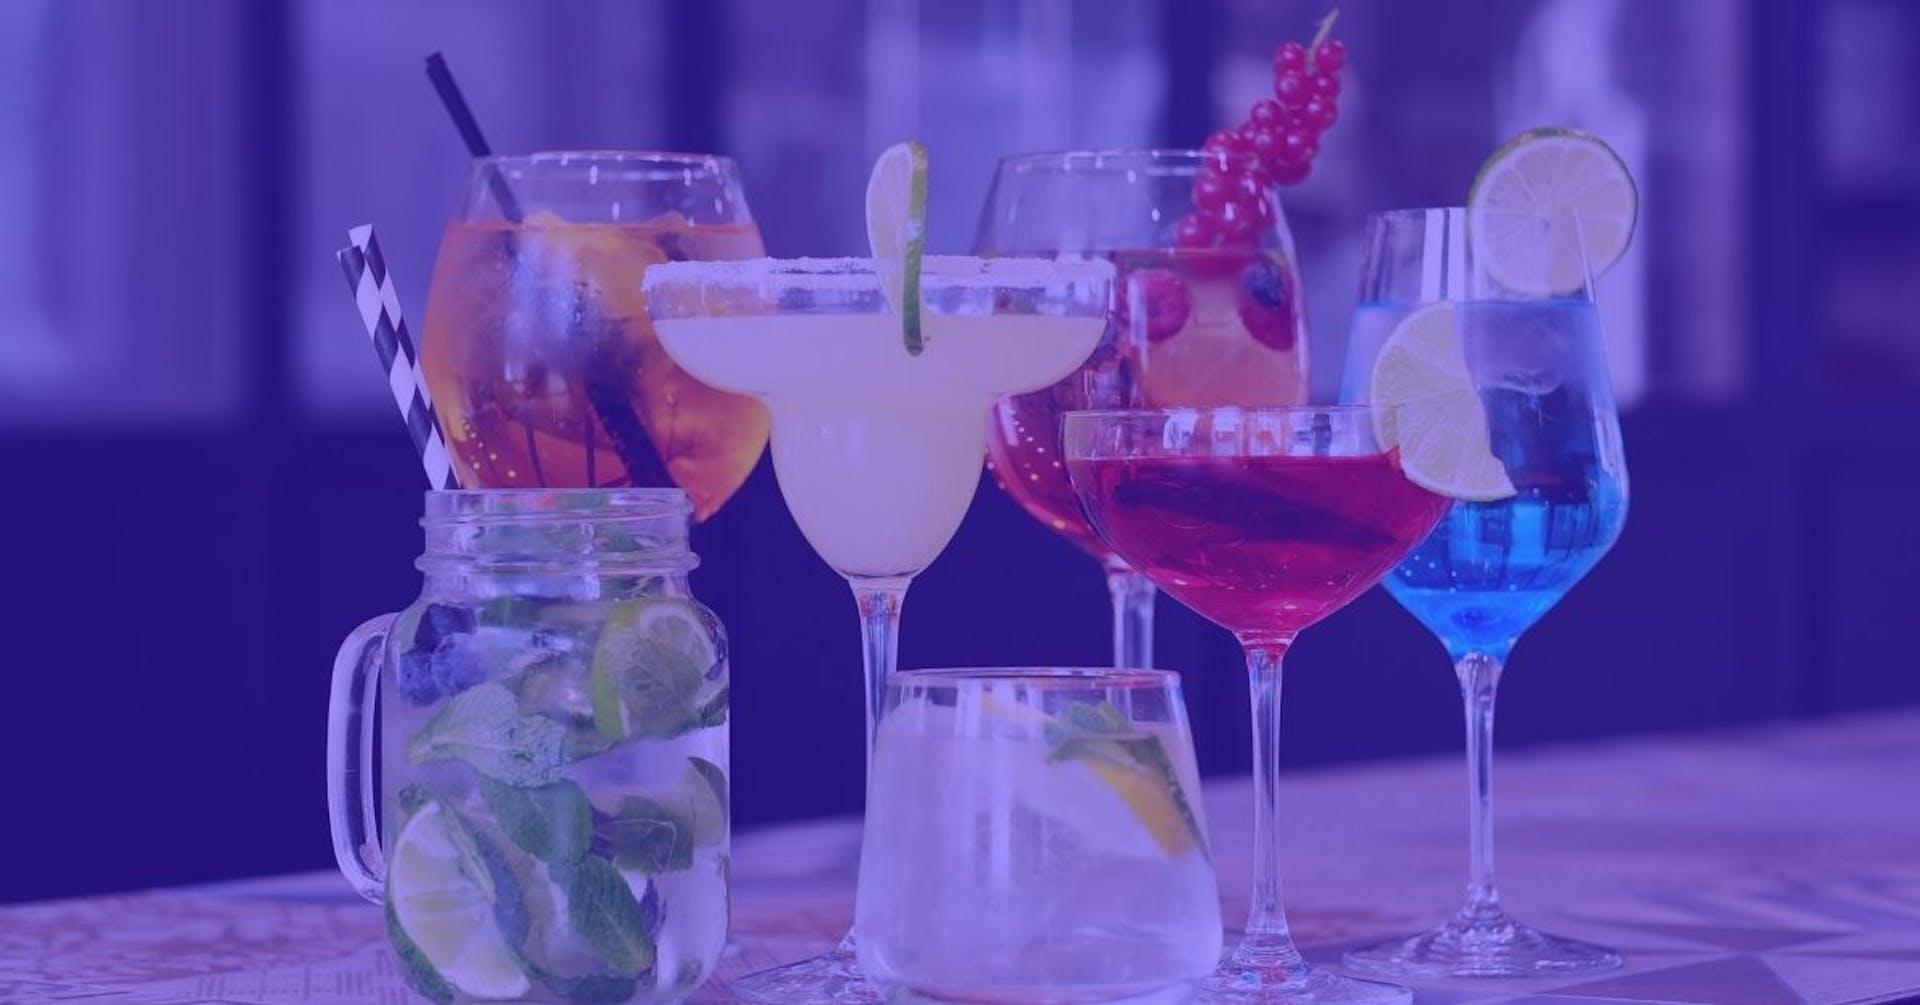 +5 recetas de cócteles sencillos para disfrutar de un buen fin de semana